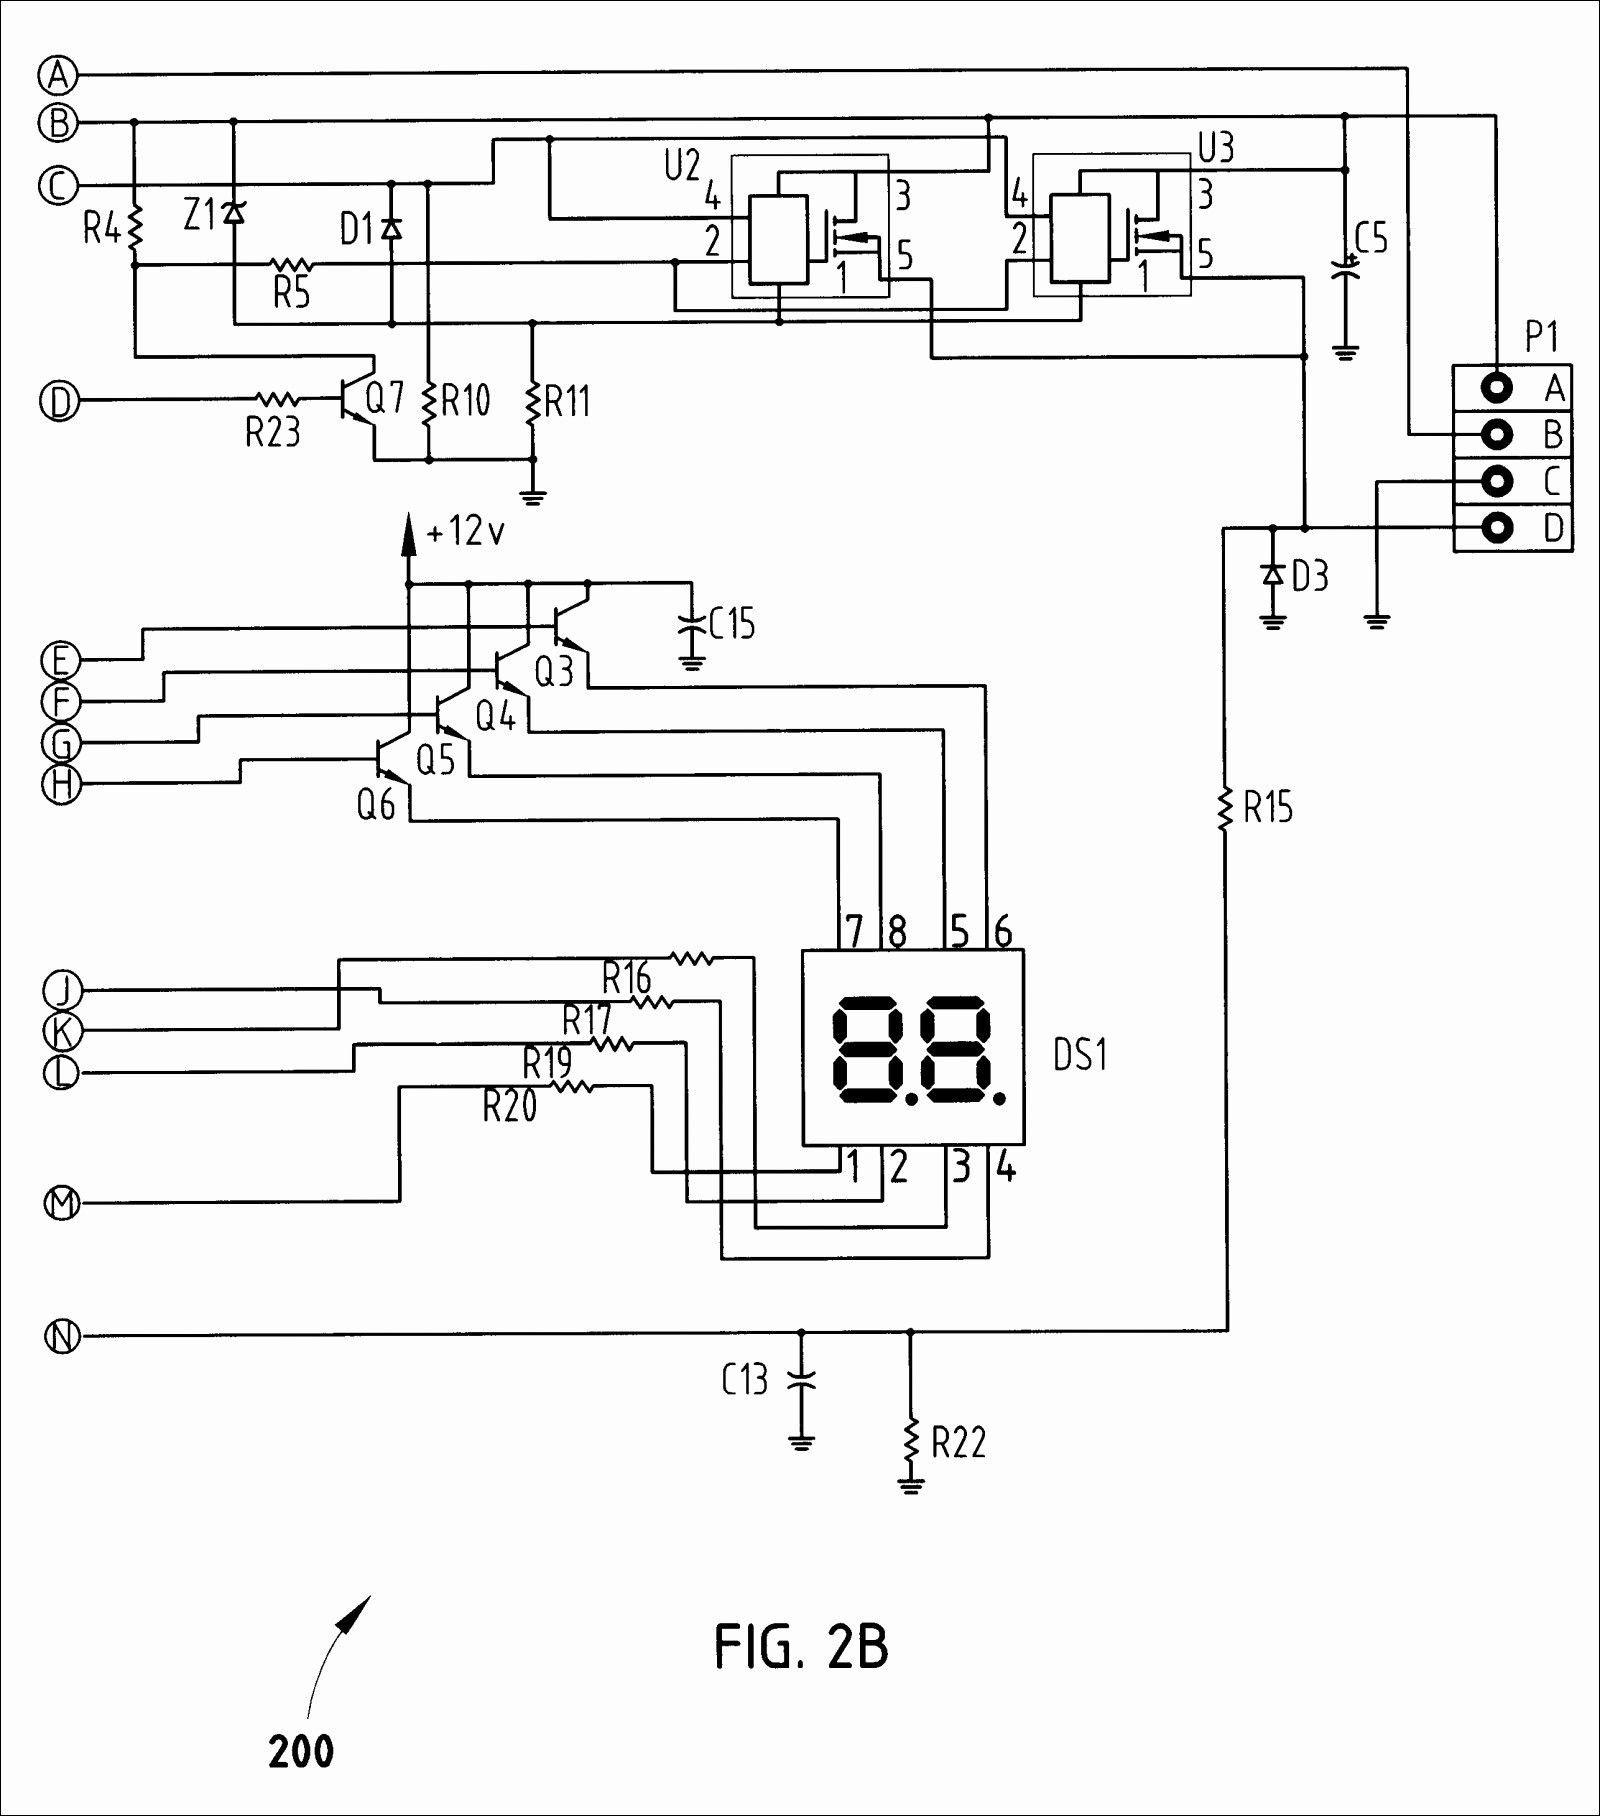 Car Voltmeter Wiring Diagram New Wiring Diagram Voltmeter Car Of Car Voltmeter Wiring Diagram